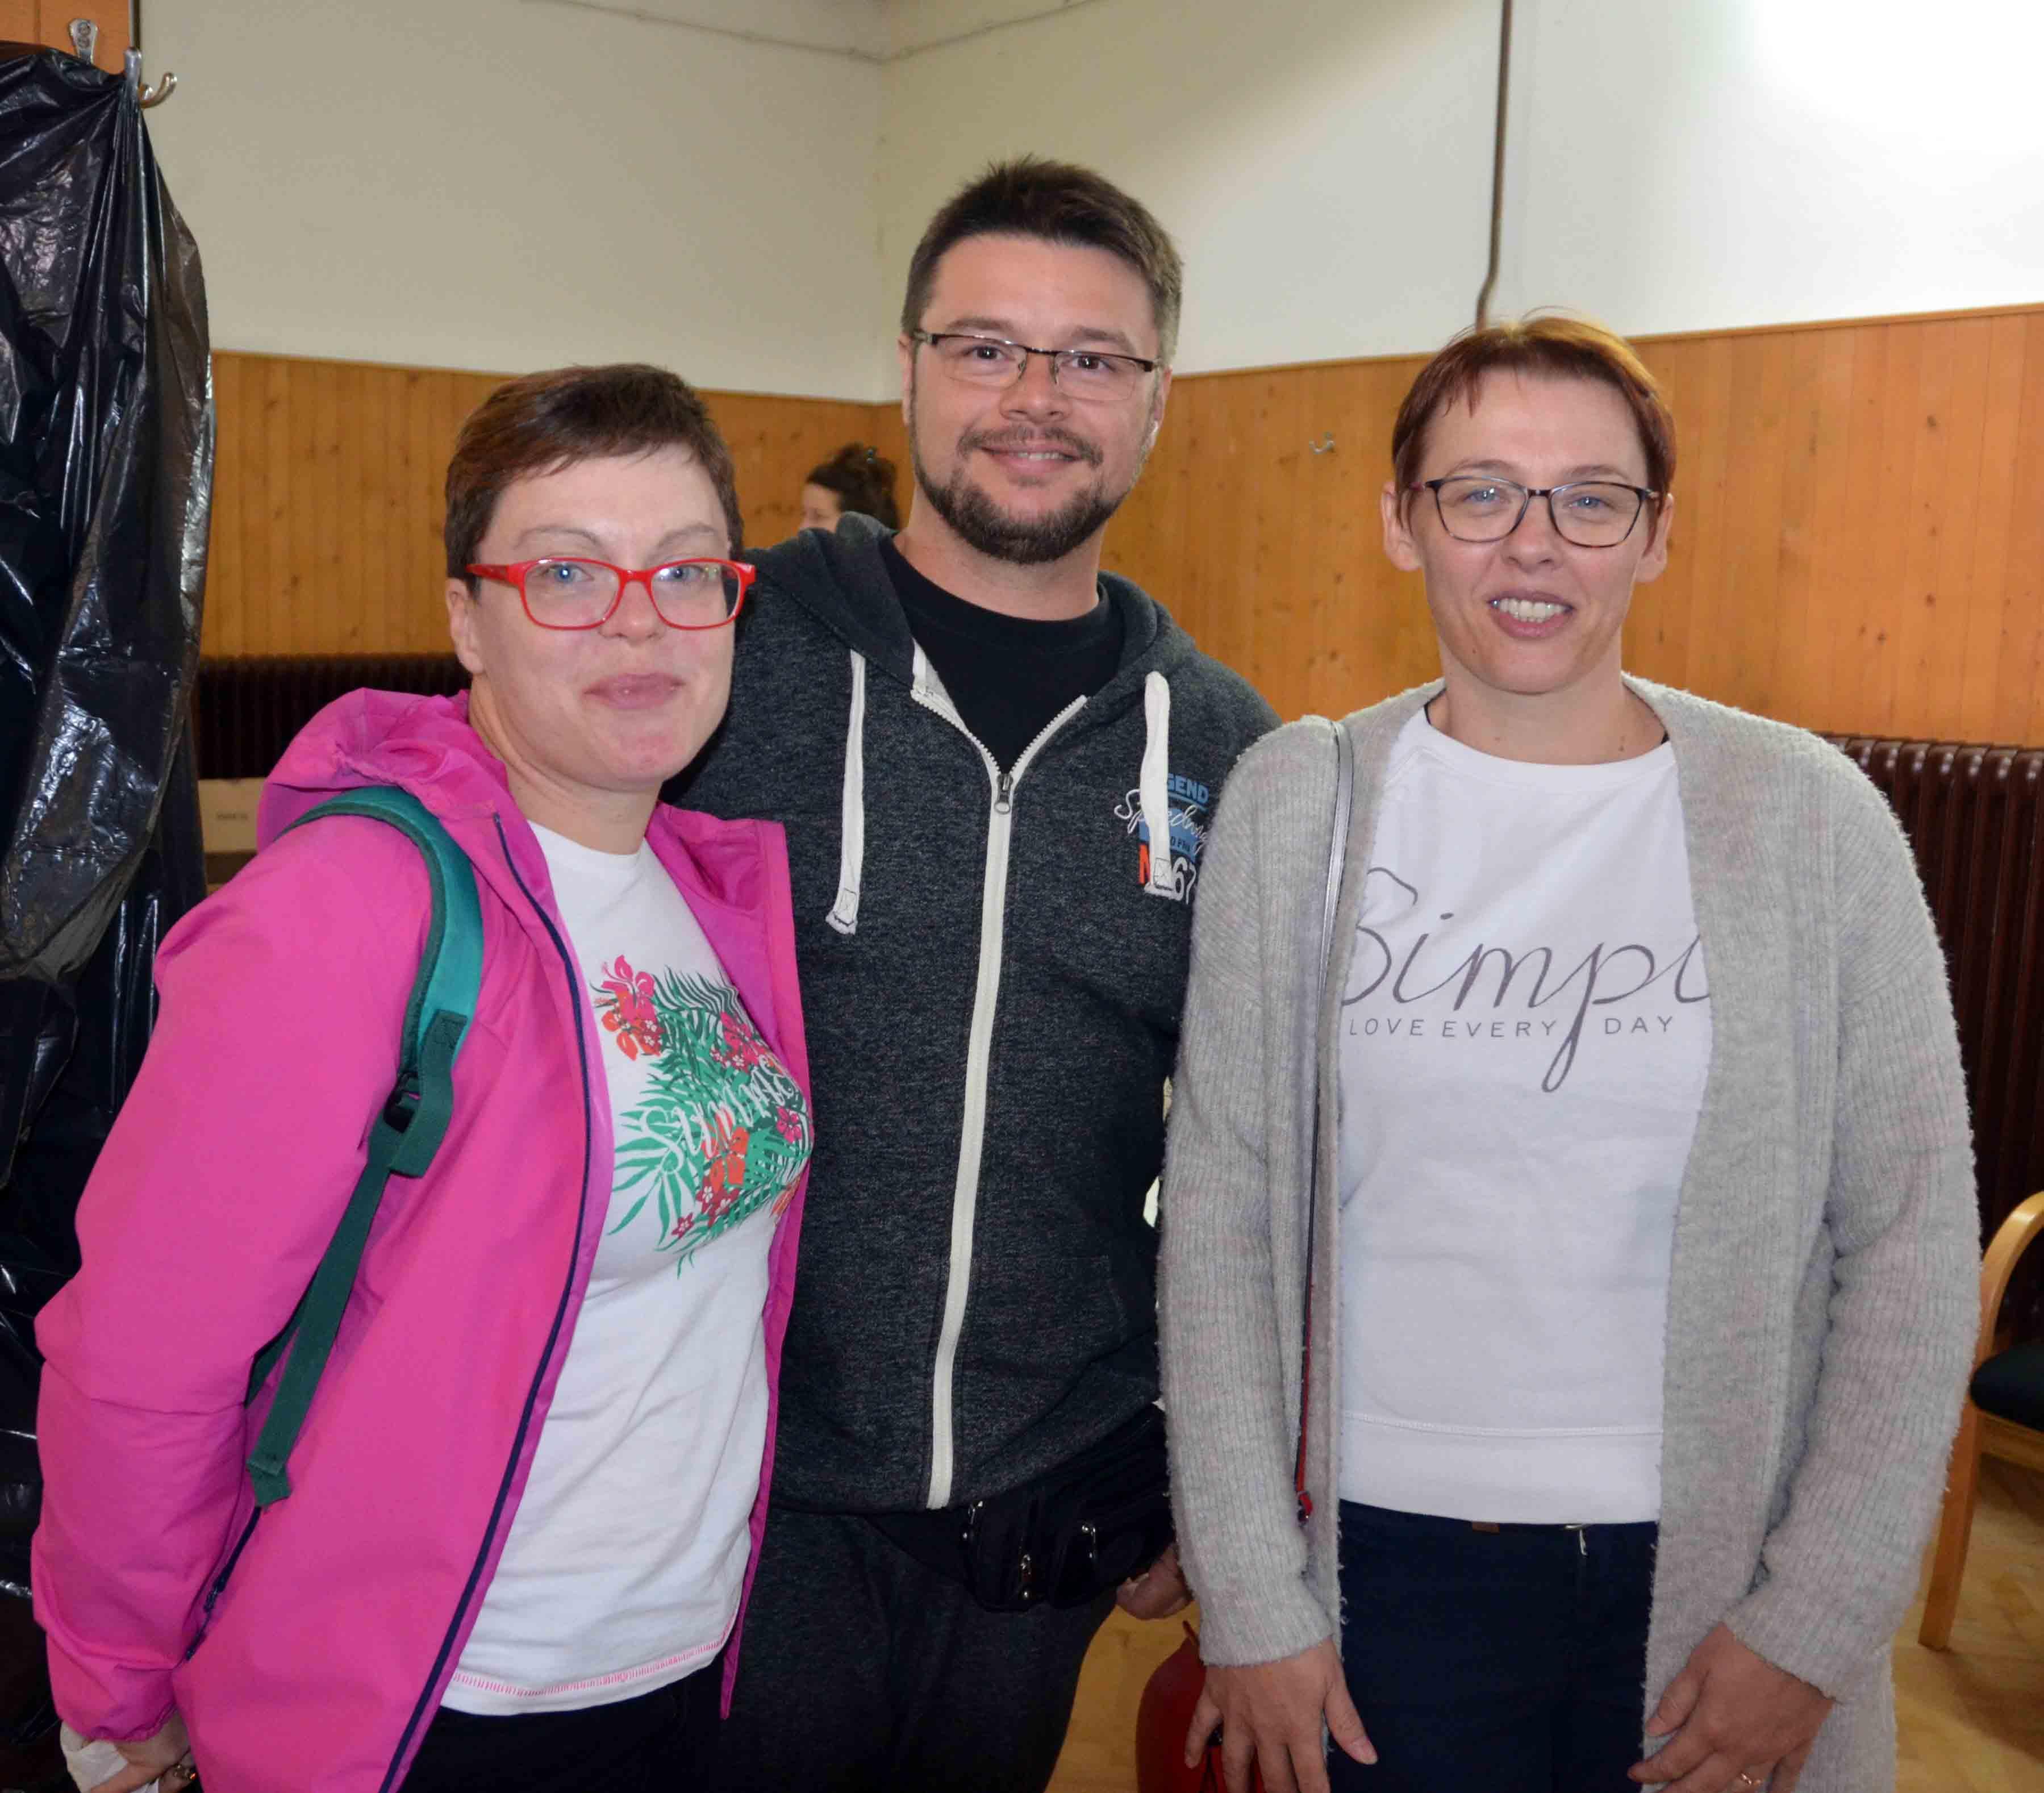 Ekipa s Krka - Iva Dujmović, Krunoslav Čuljak i Sandra Jurković / Snimio Marinko KRMPOTIĆ